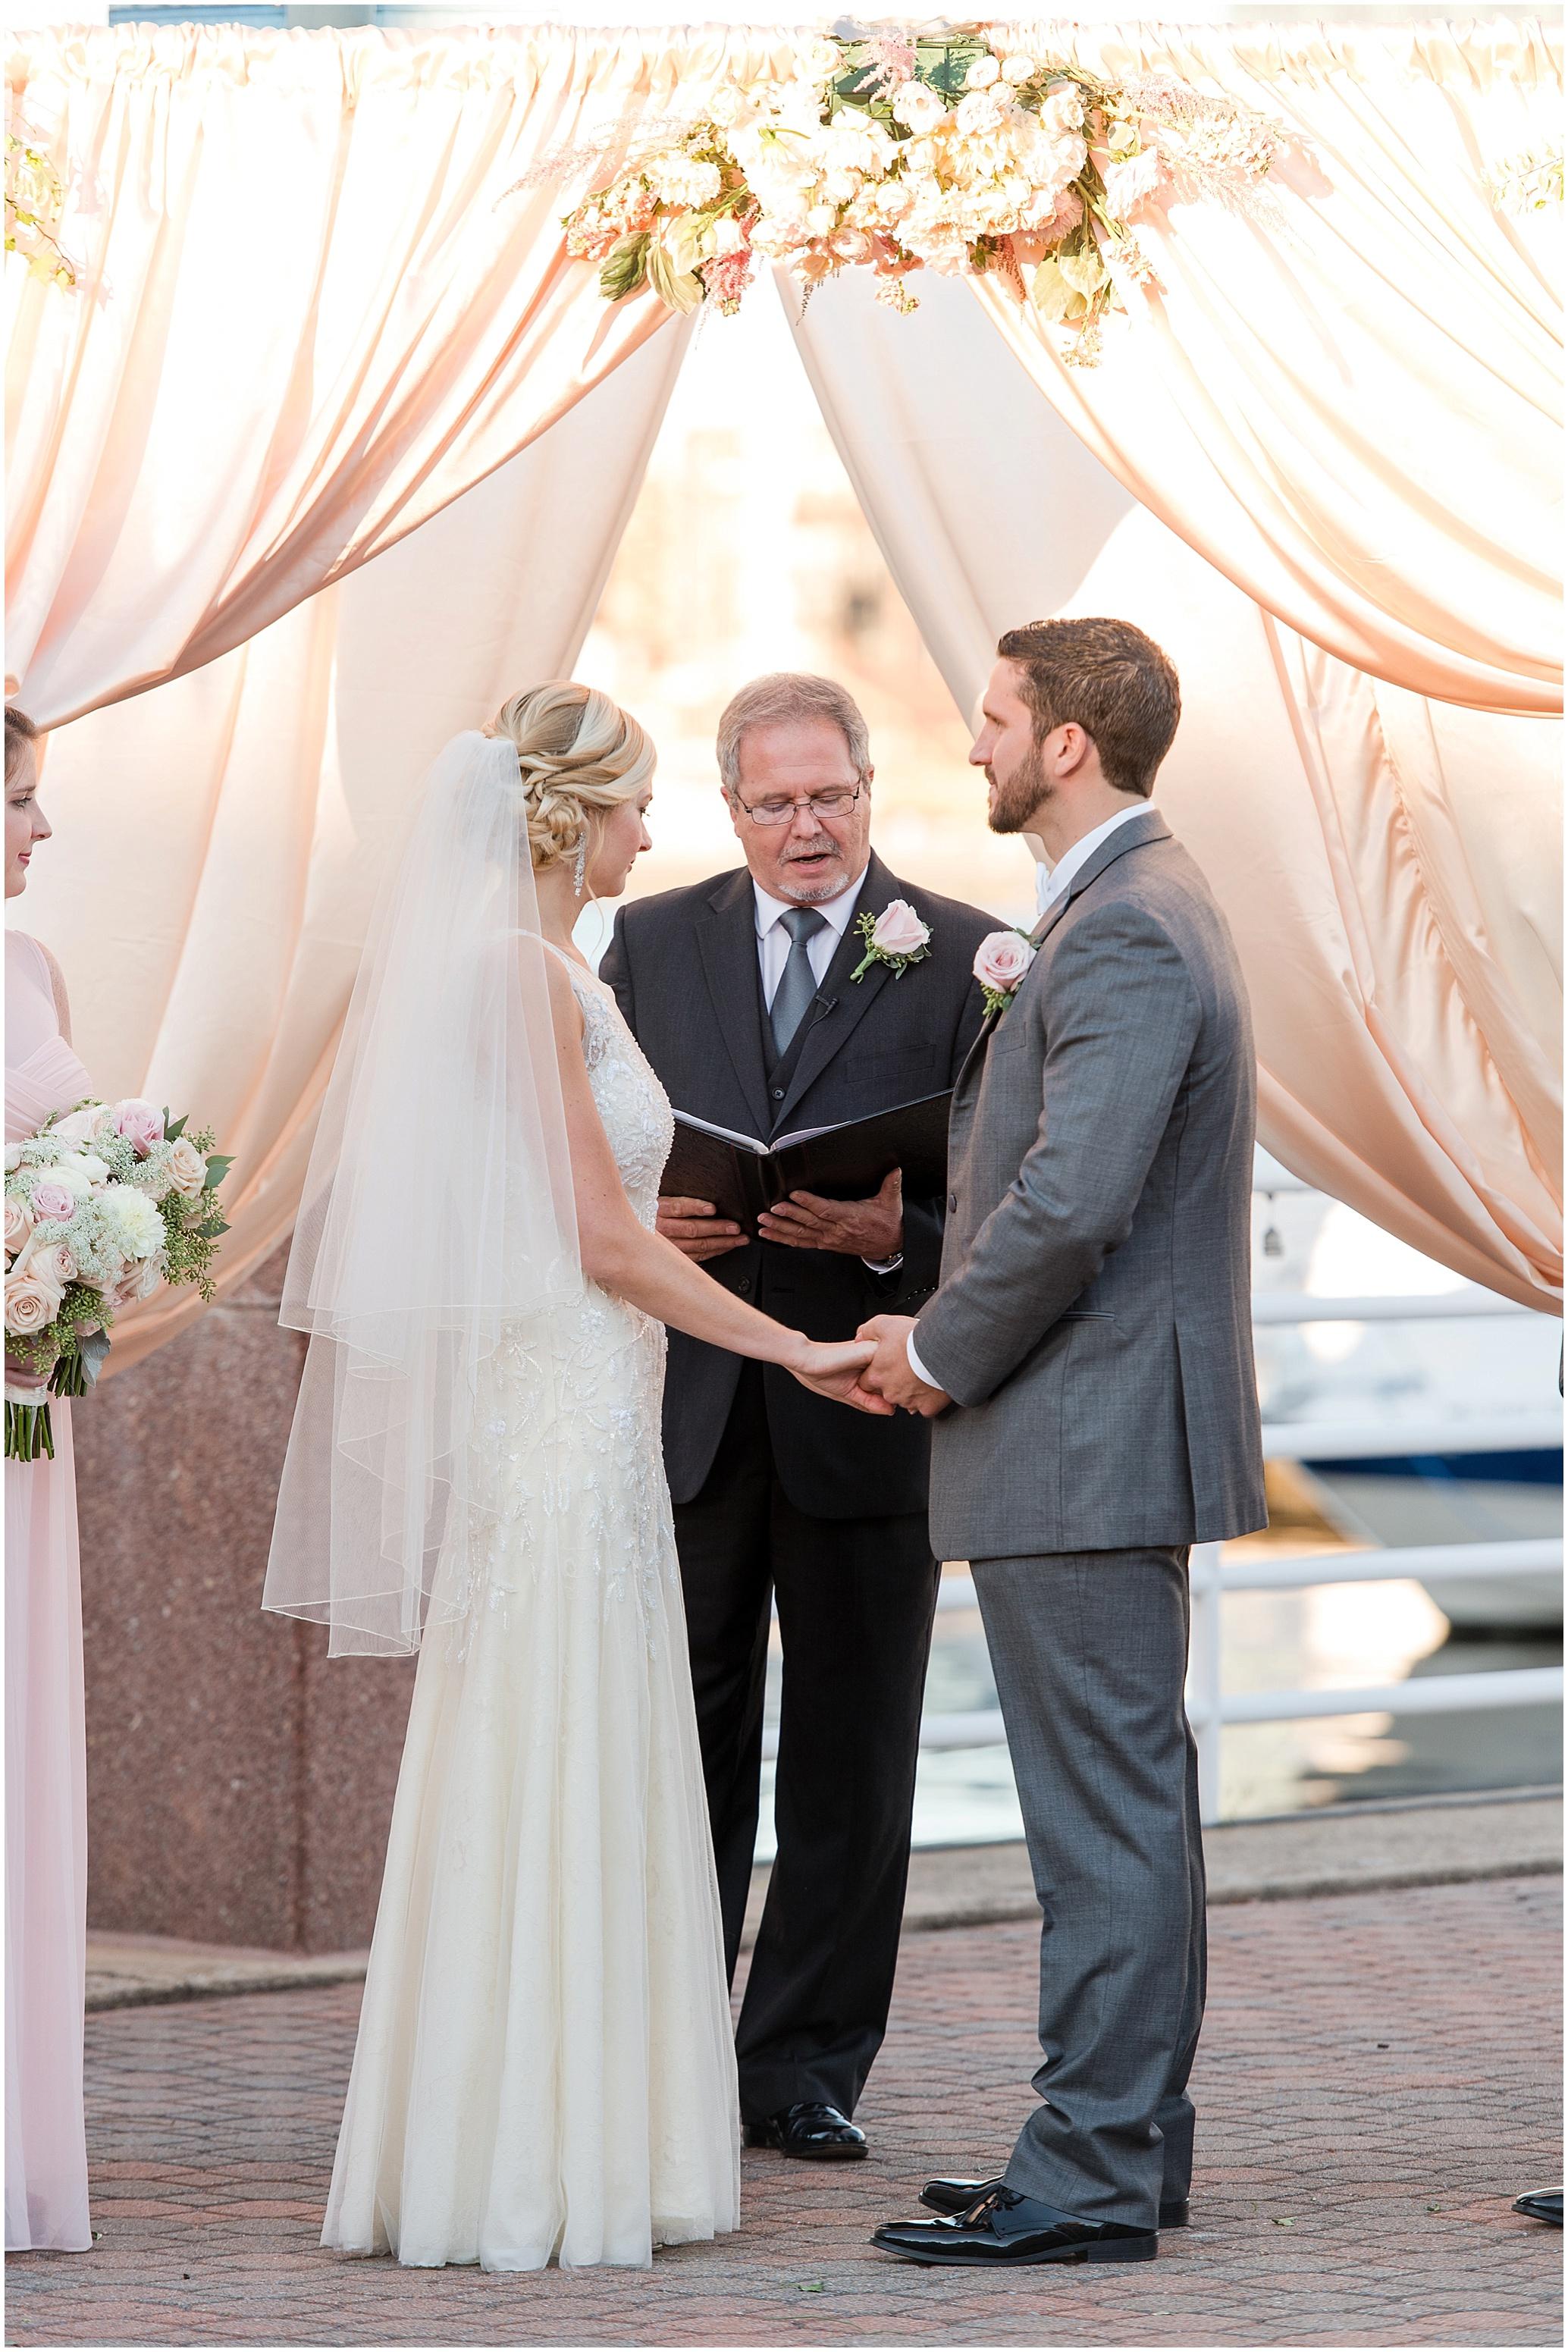 Hannah Leigh Photography Tabrizis Baltimore Wedding_2309.jpg